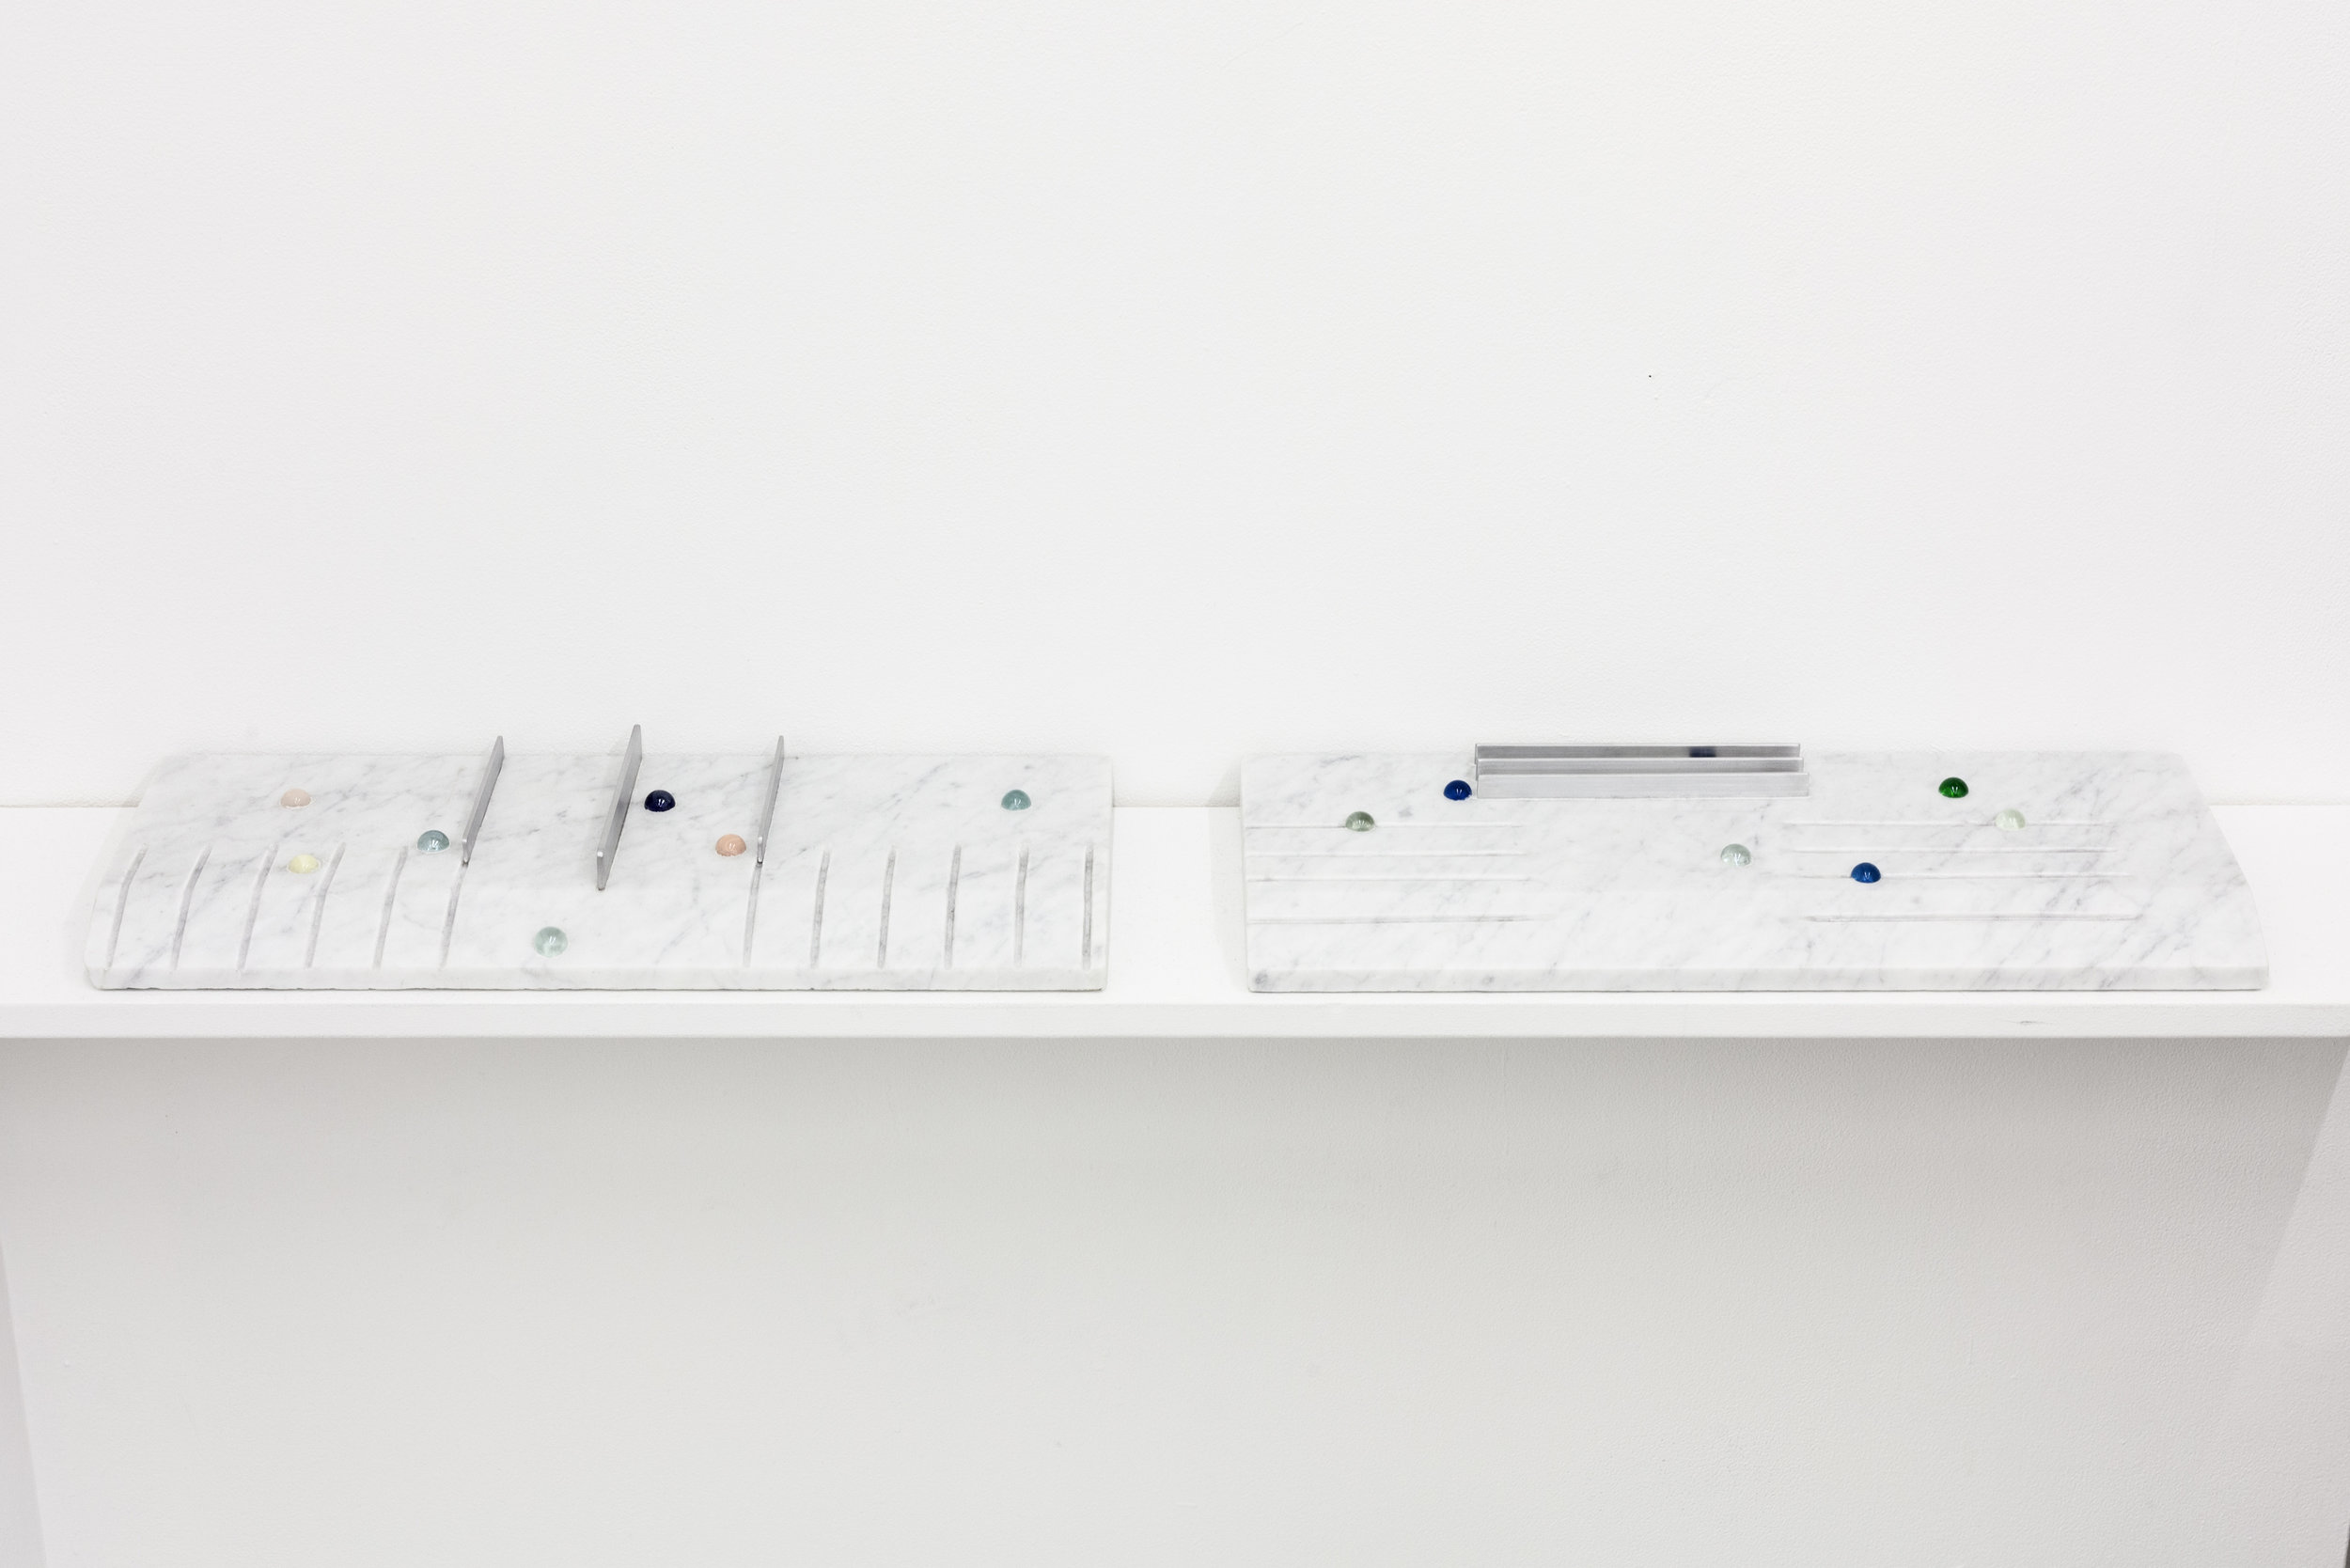 """Short Cut Keys Tablet"" (1, 2)  18"" x 7"" x 2"" Carrara marble slab, glass marbles, aluminum 2018"